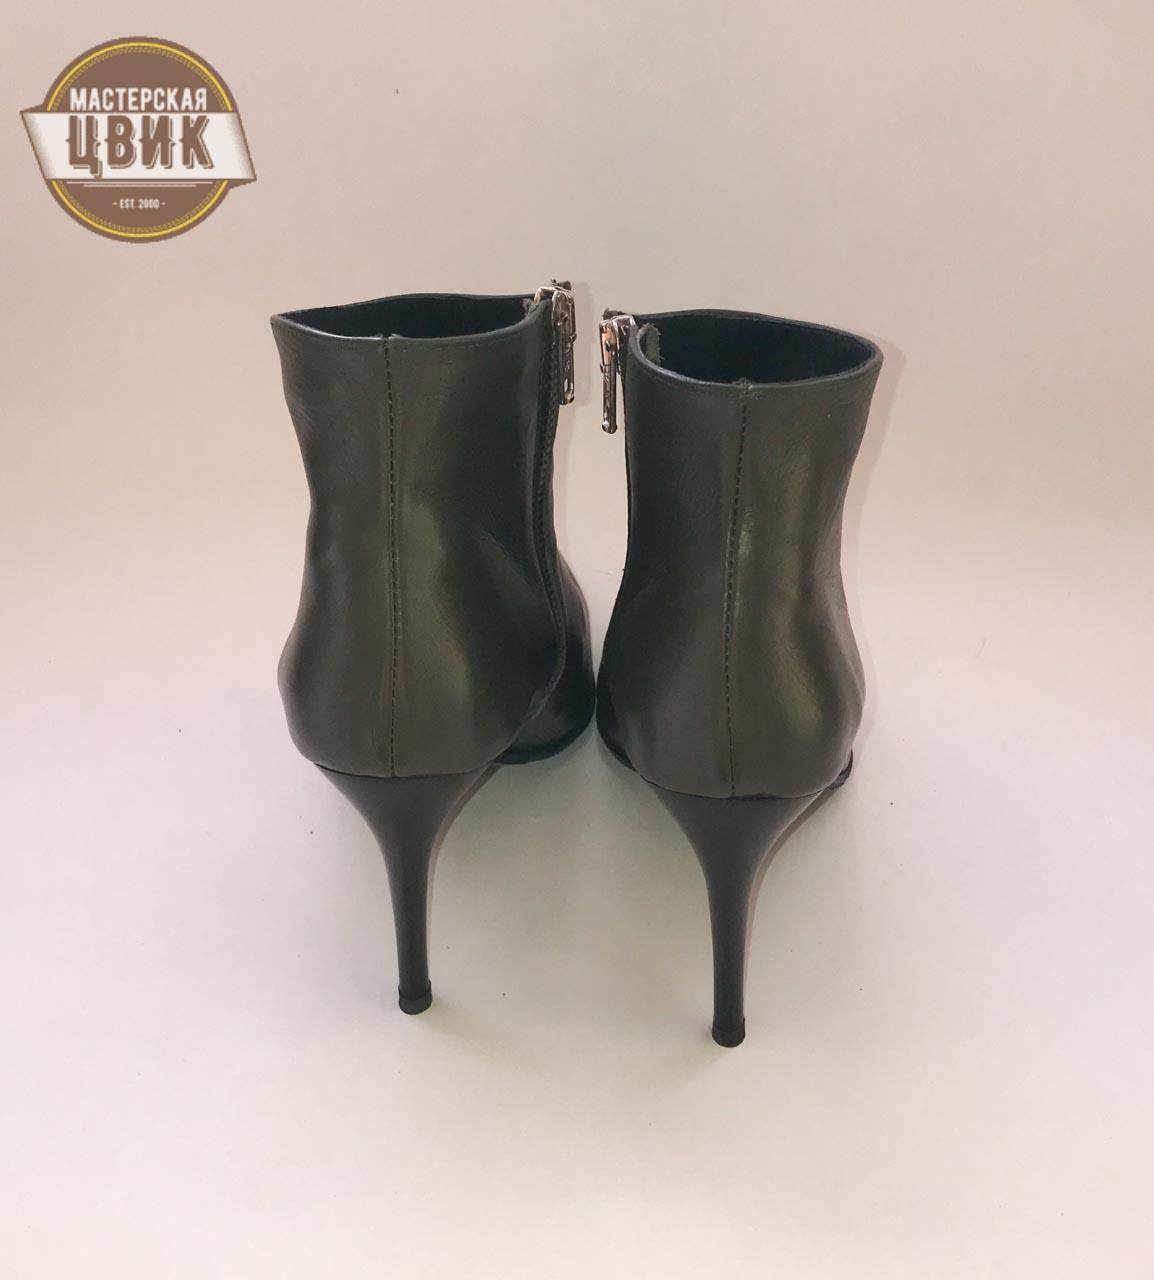 individualnyj-poshiv-obuvi-minsk-42 Индивидуальный пошив обуви Минск-42